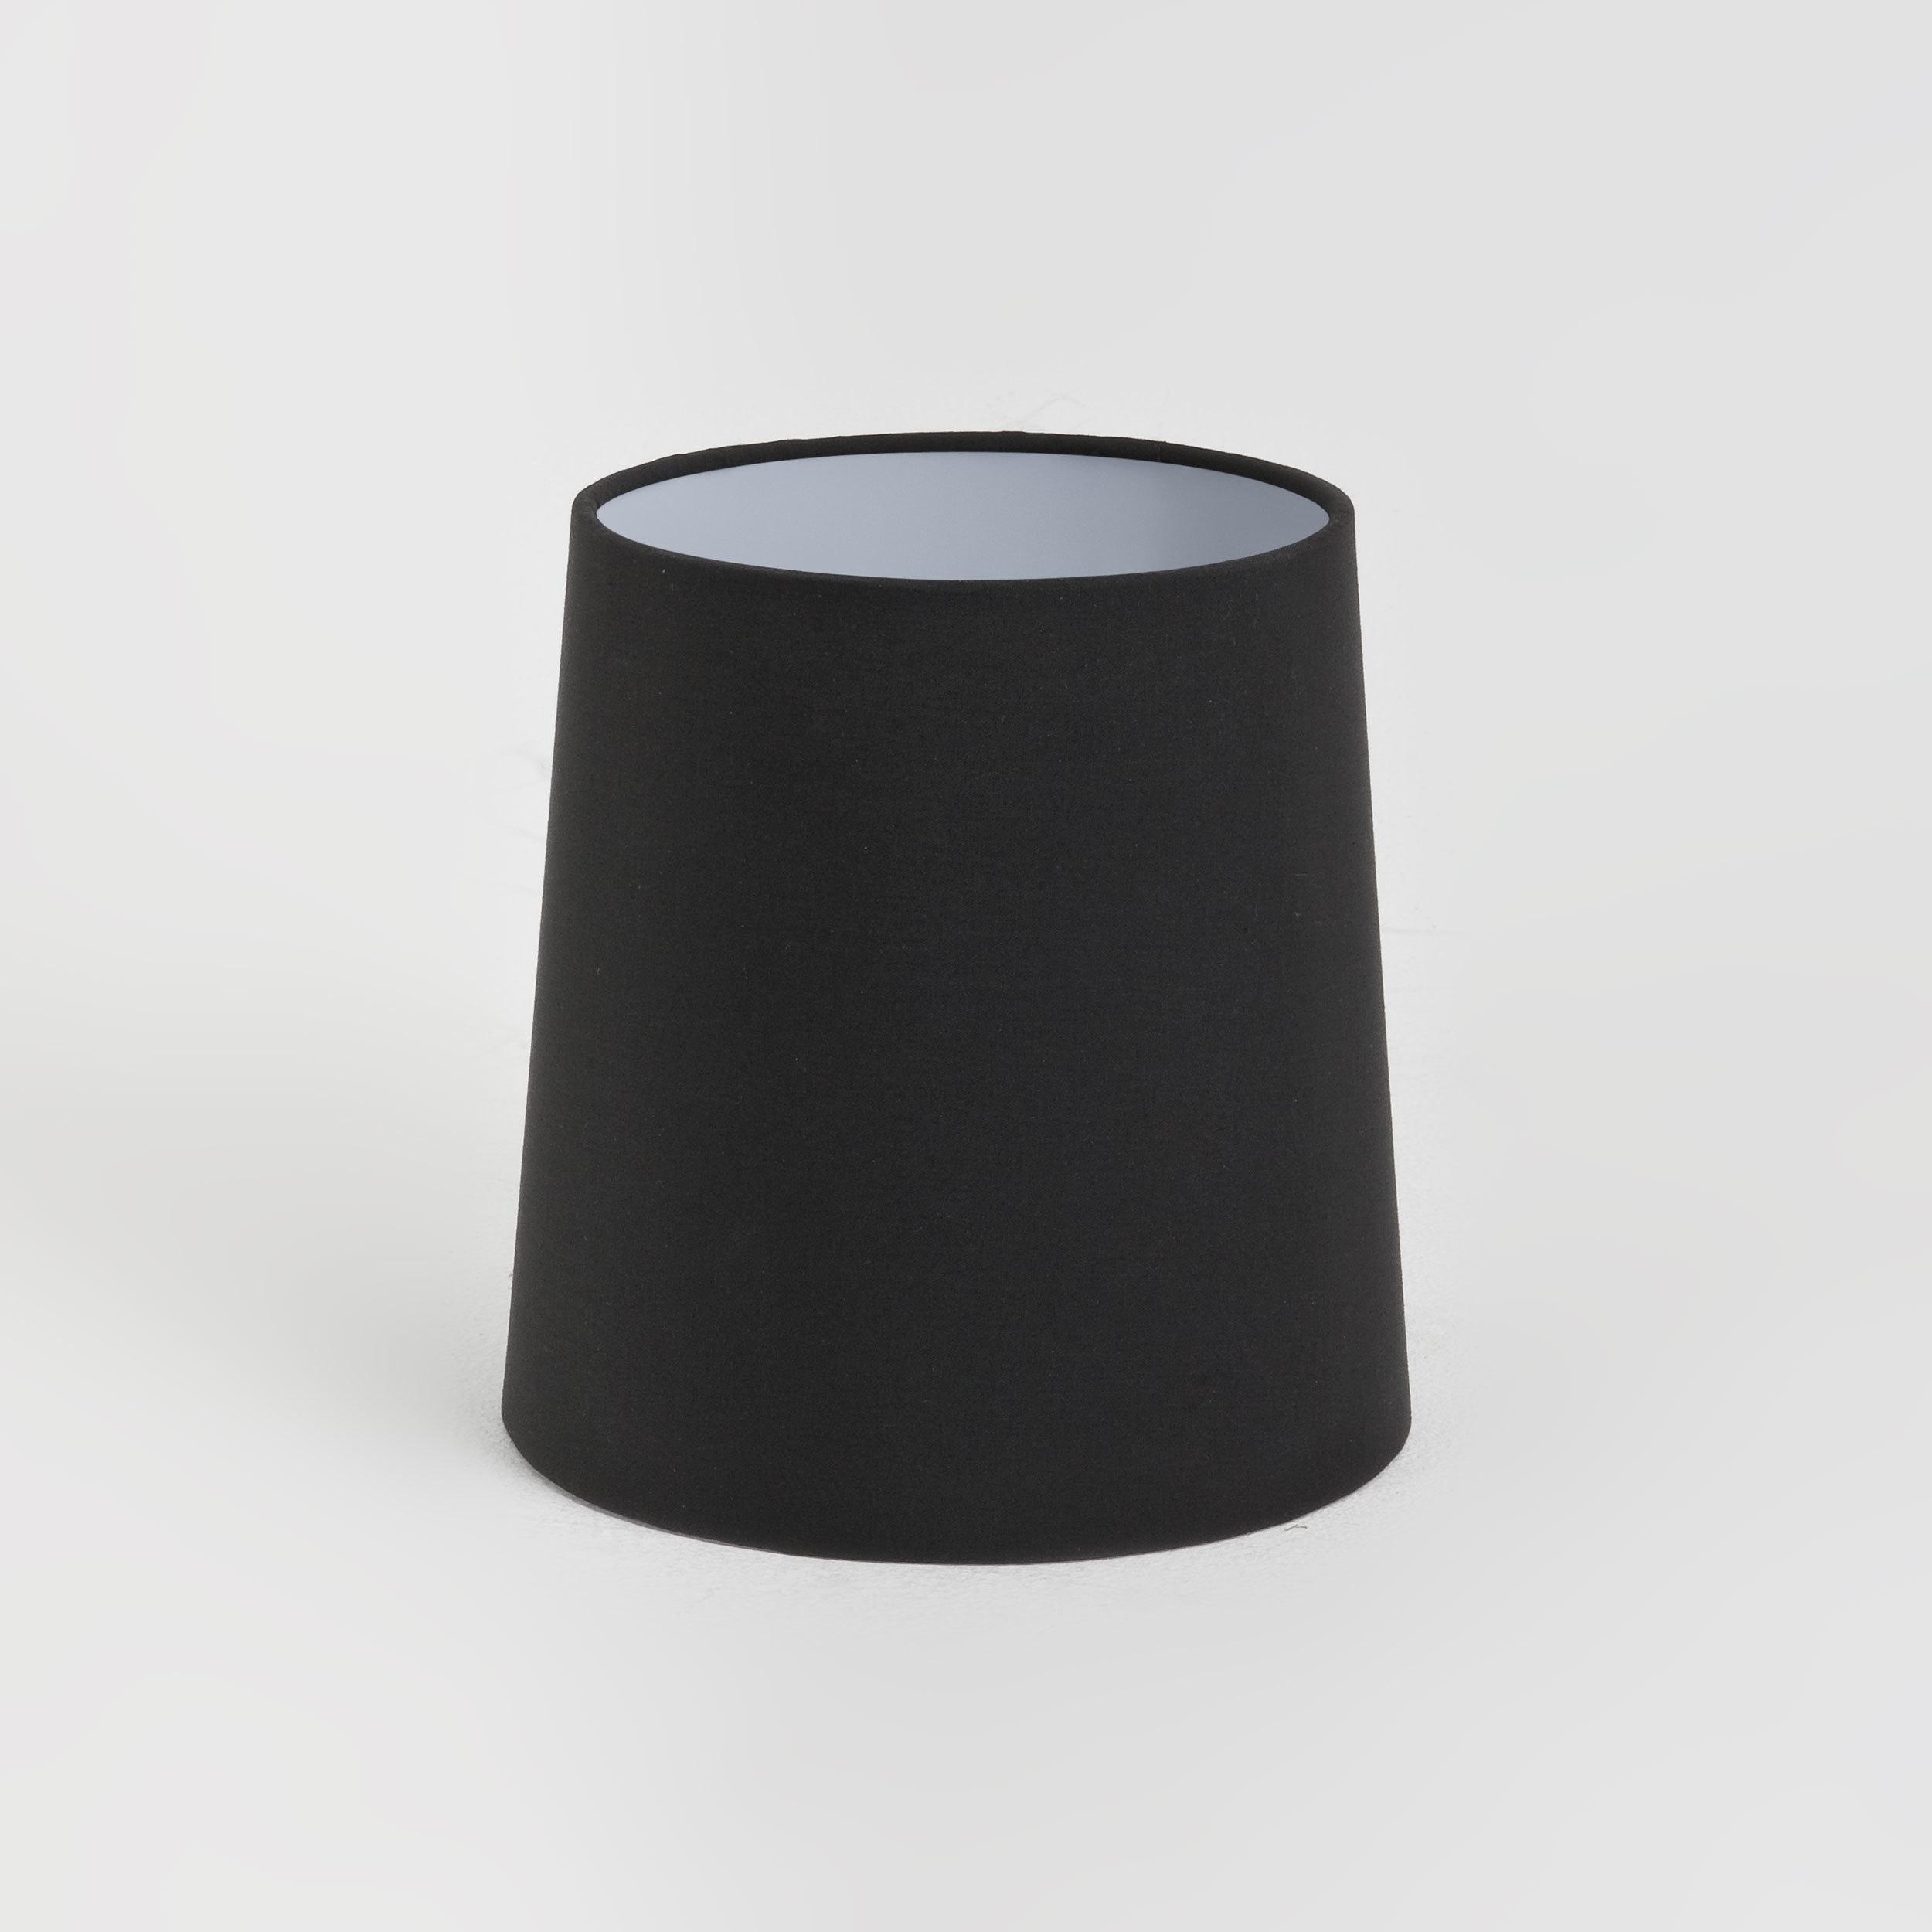 Абажур Astro Cone 5018012 (4139), черный, текстиль - фото 1